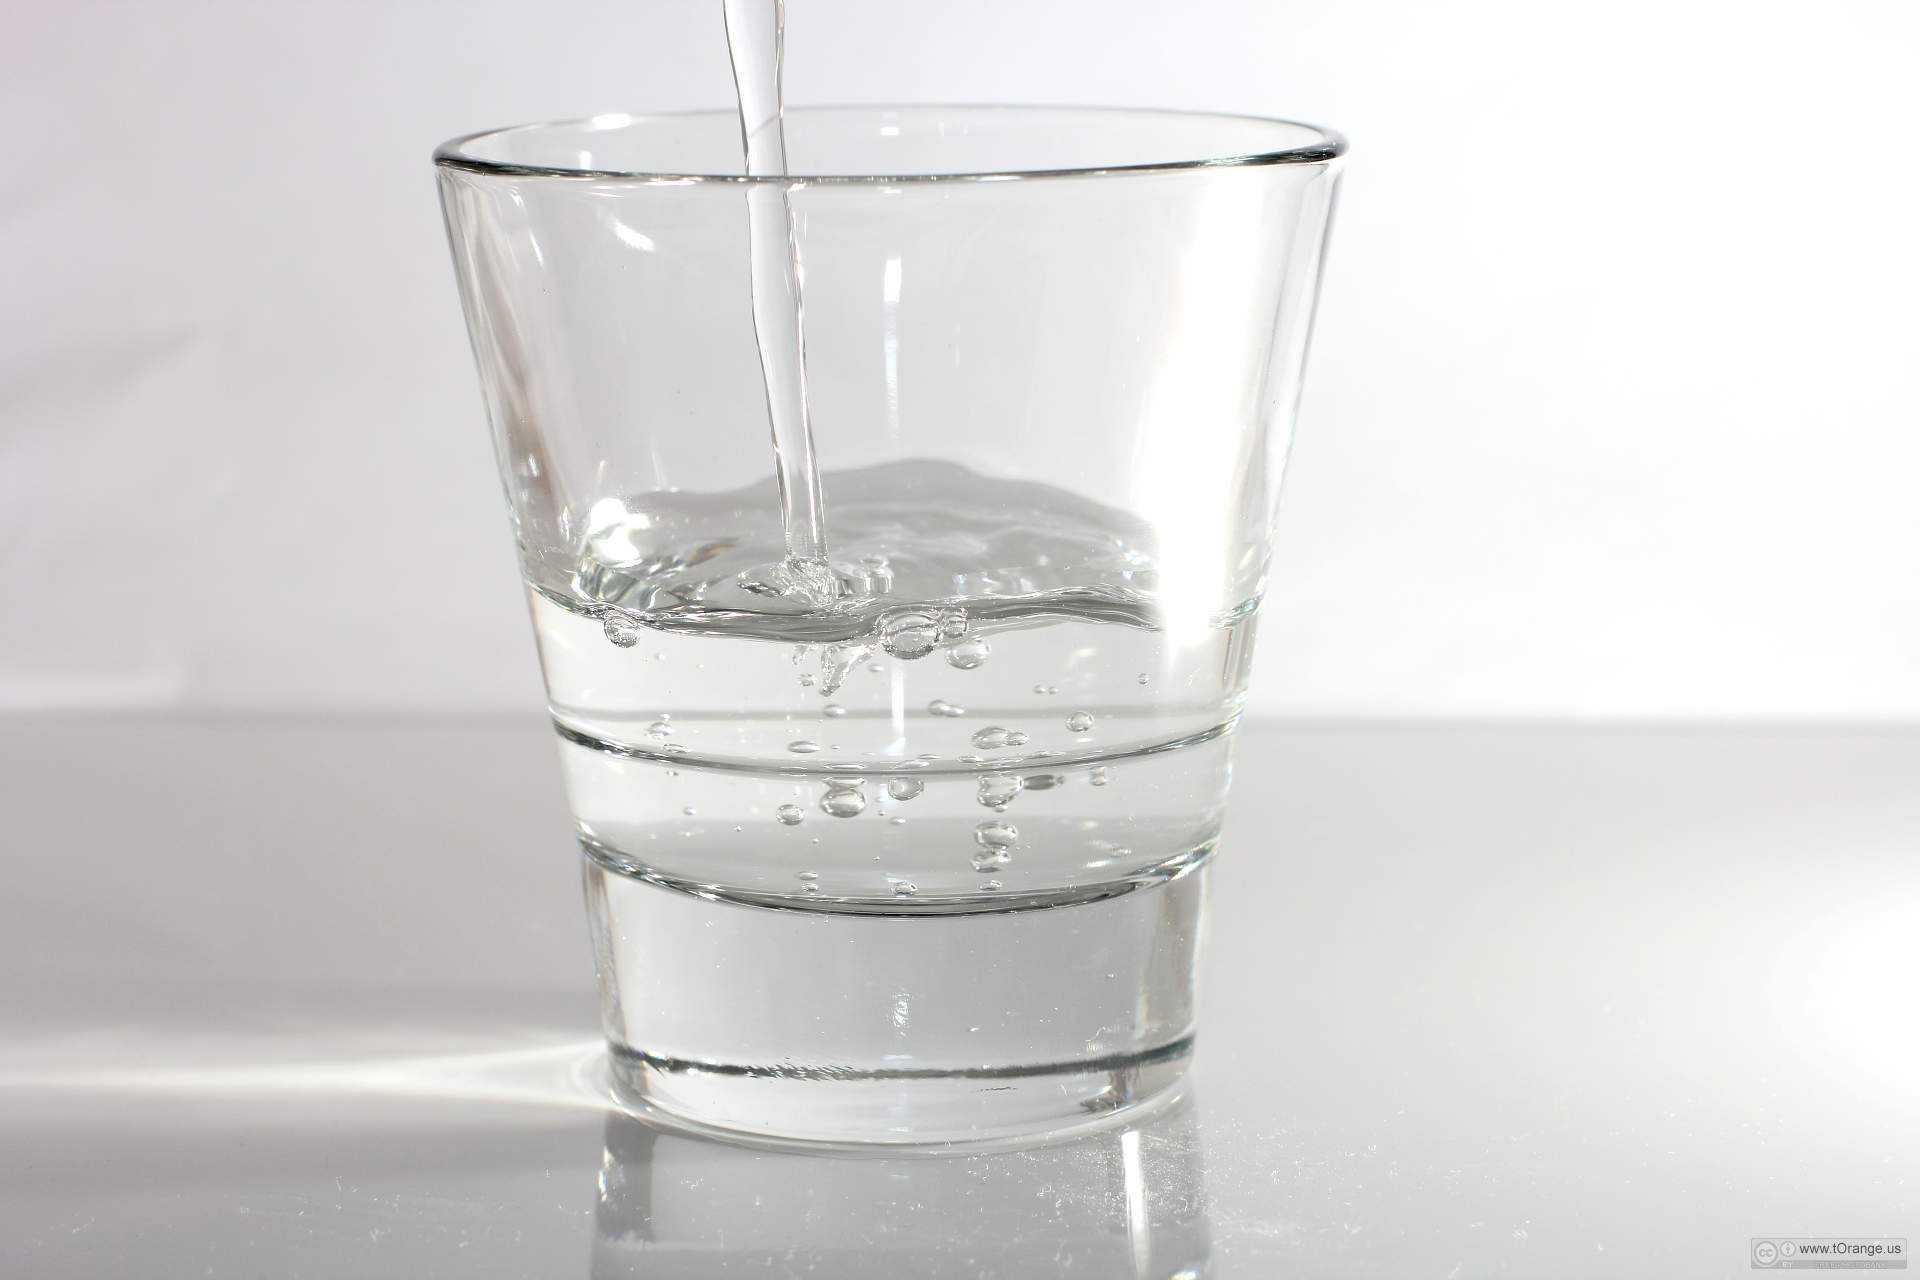 drink water always